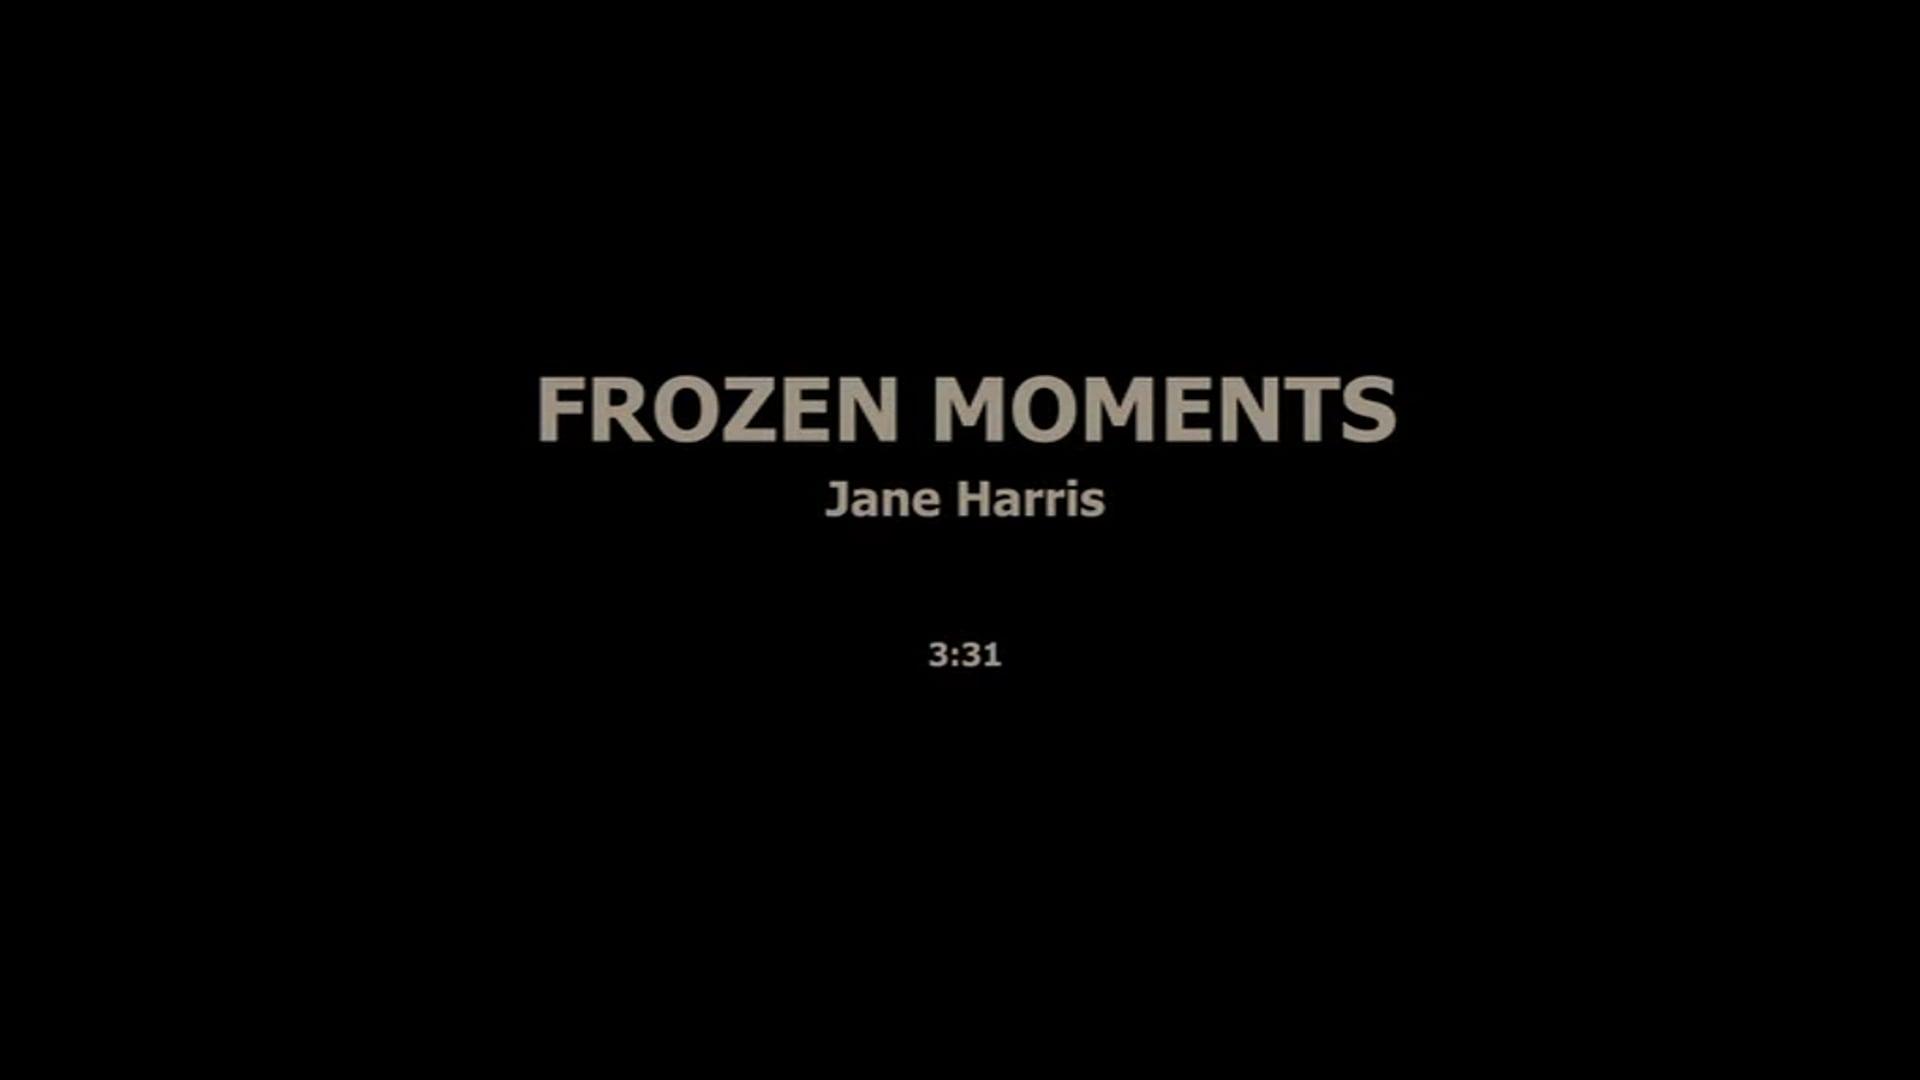 FROZEN MOMENTS - JANE HARRIS